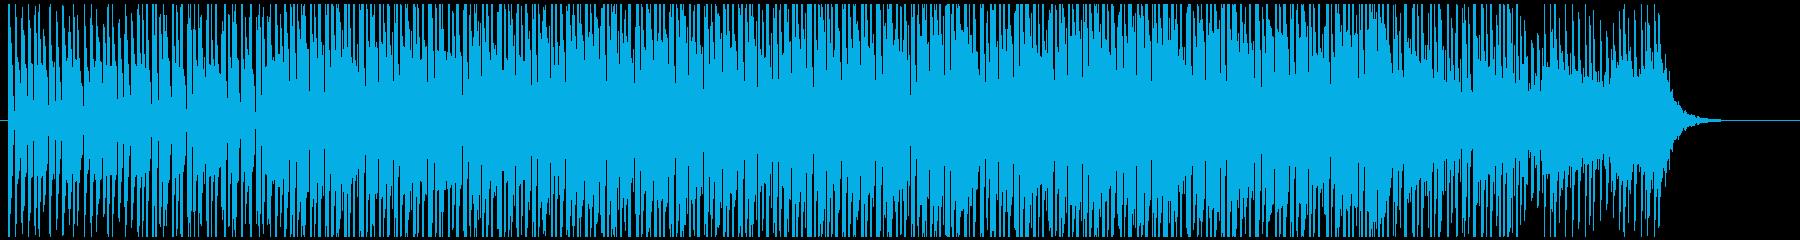 【CM・映像】おしゃれなエレクトロBGMの再生済みの波形